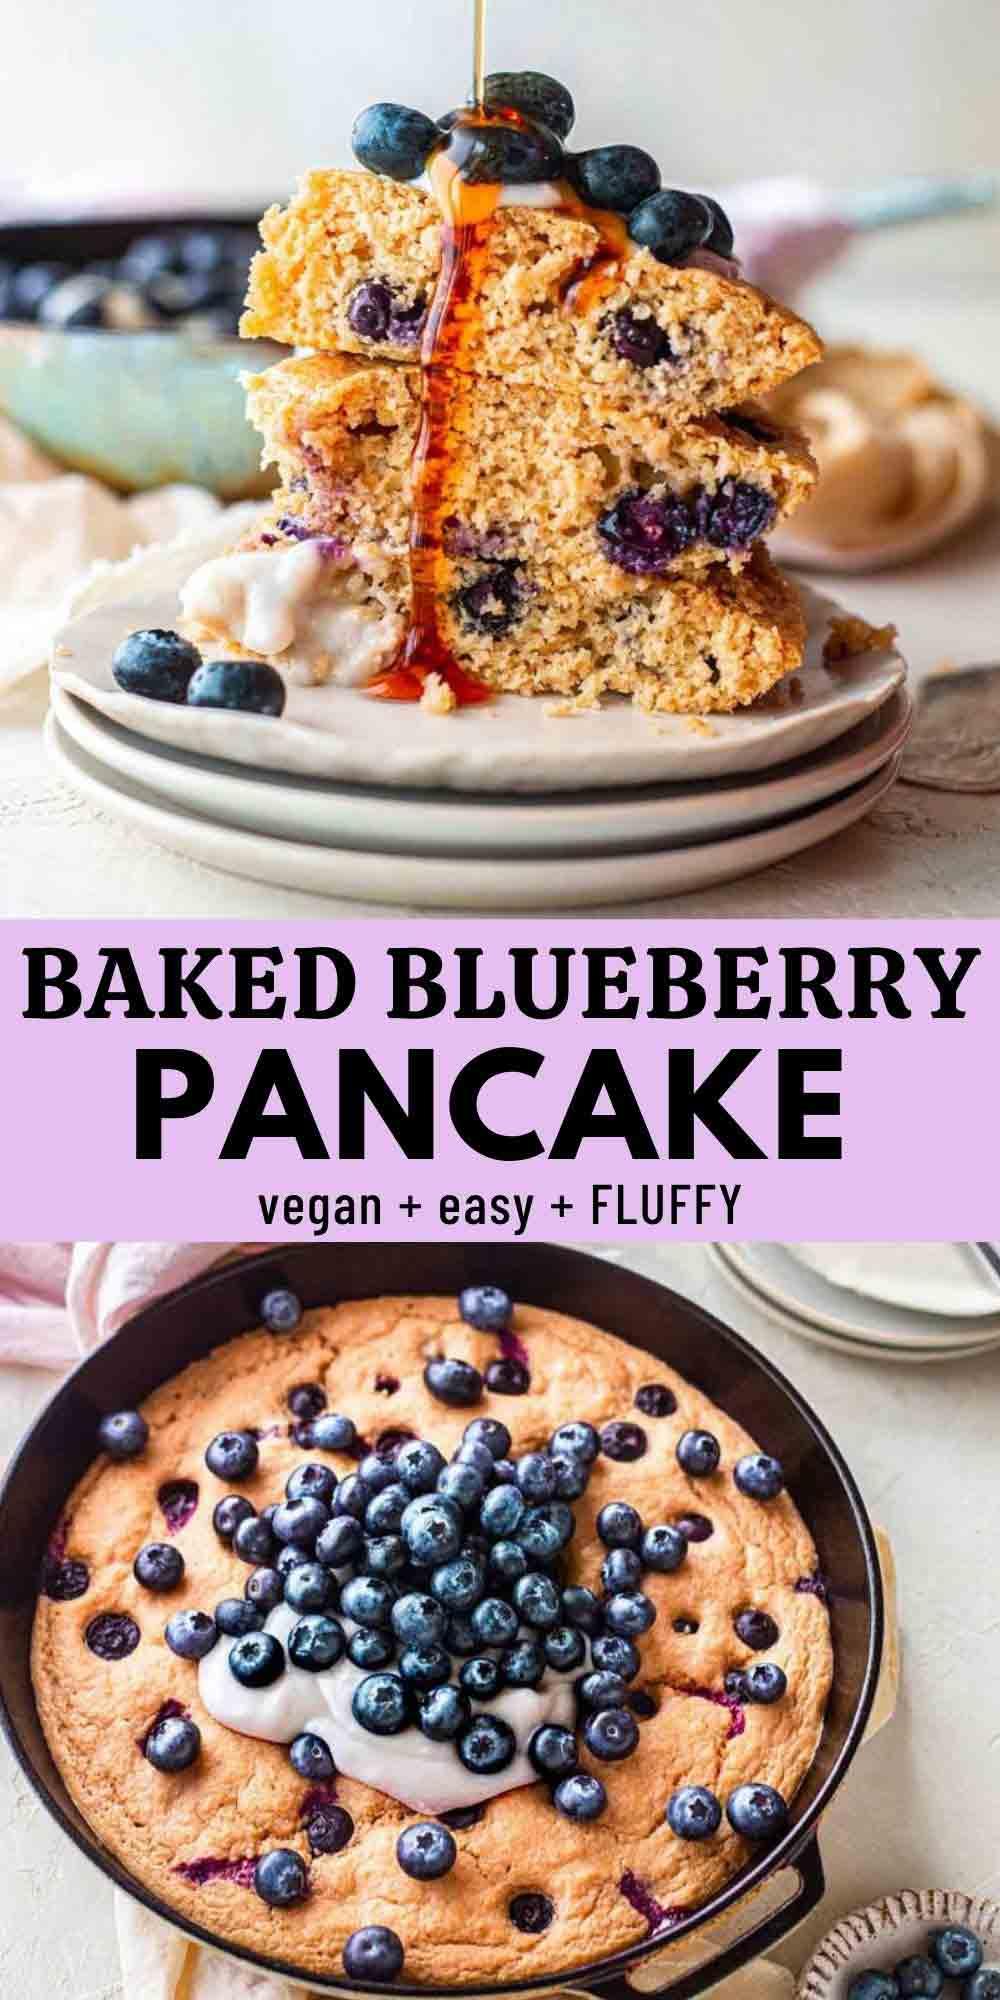 Easiest Baked Vegan Blueberry Pancake